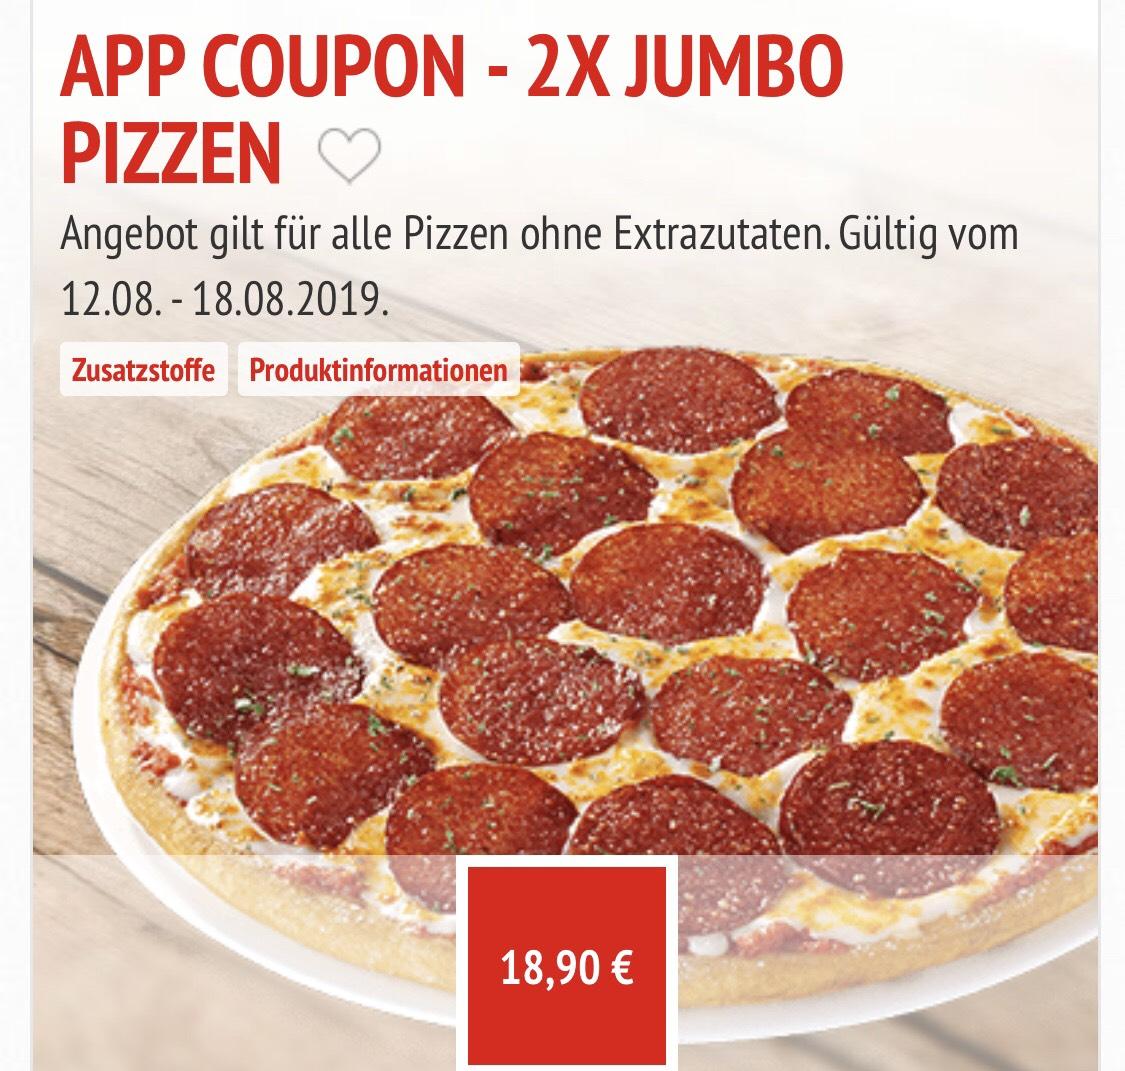 Call a Pizza - Jumbo doppelt erhalten!